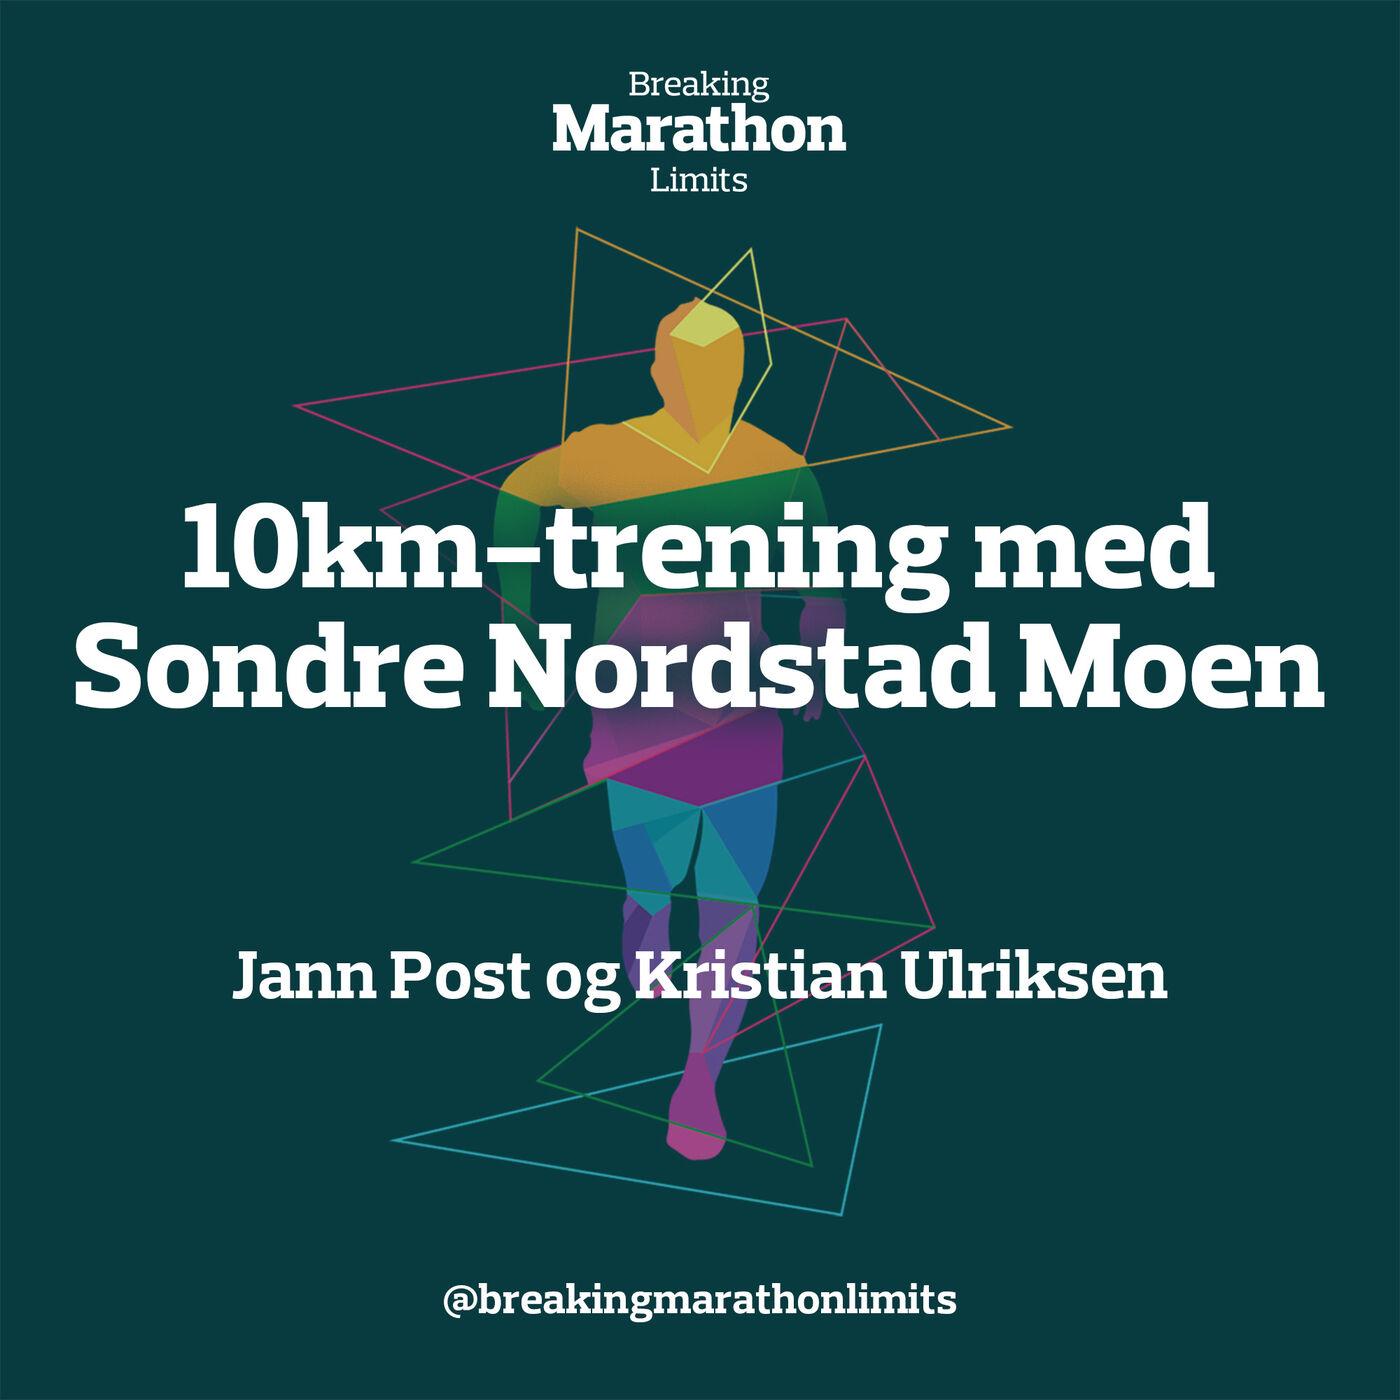 10km-trening med Sondre Nordstad Moen